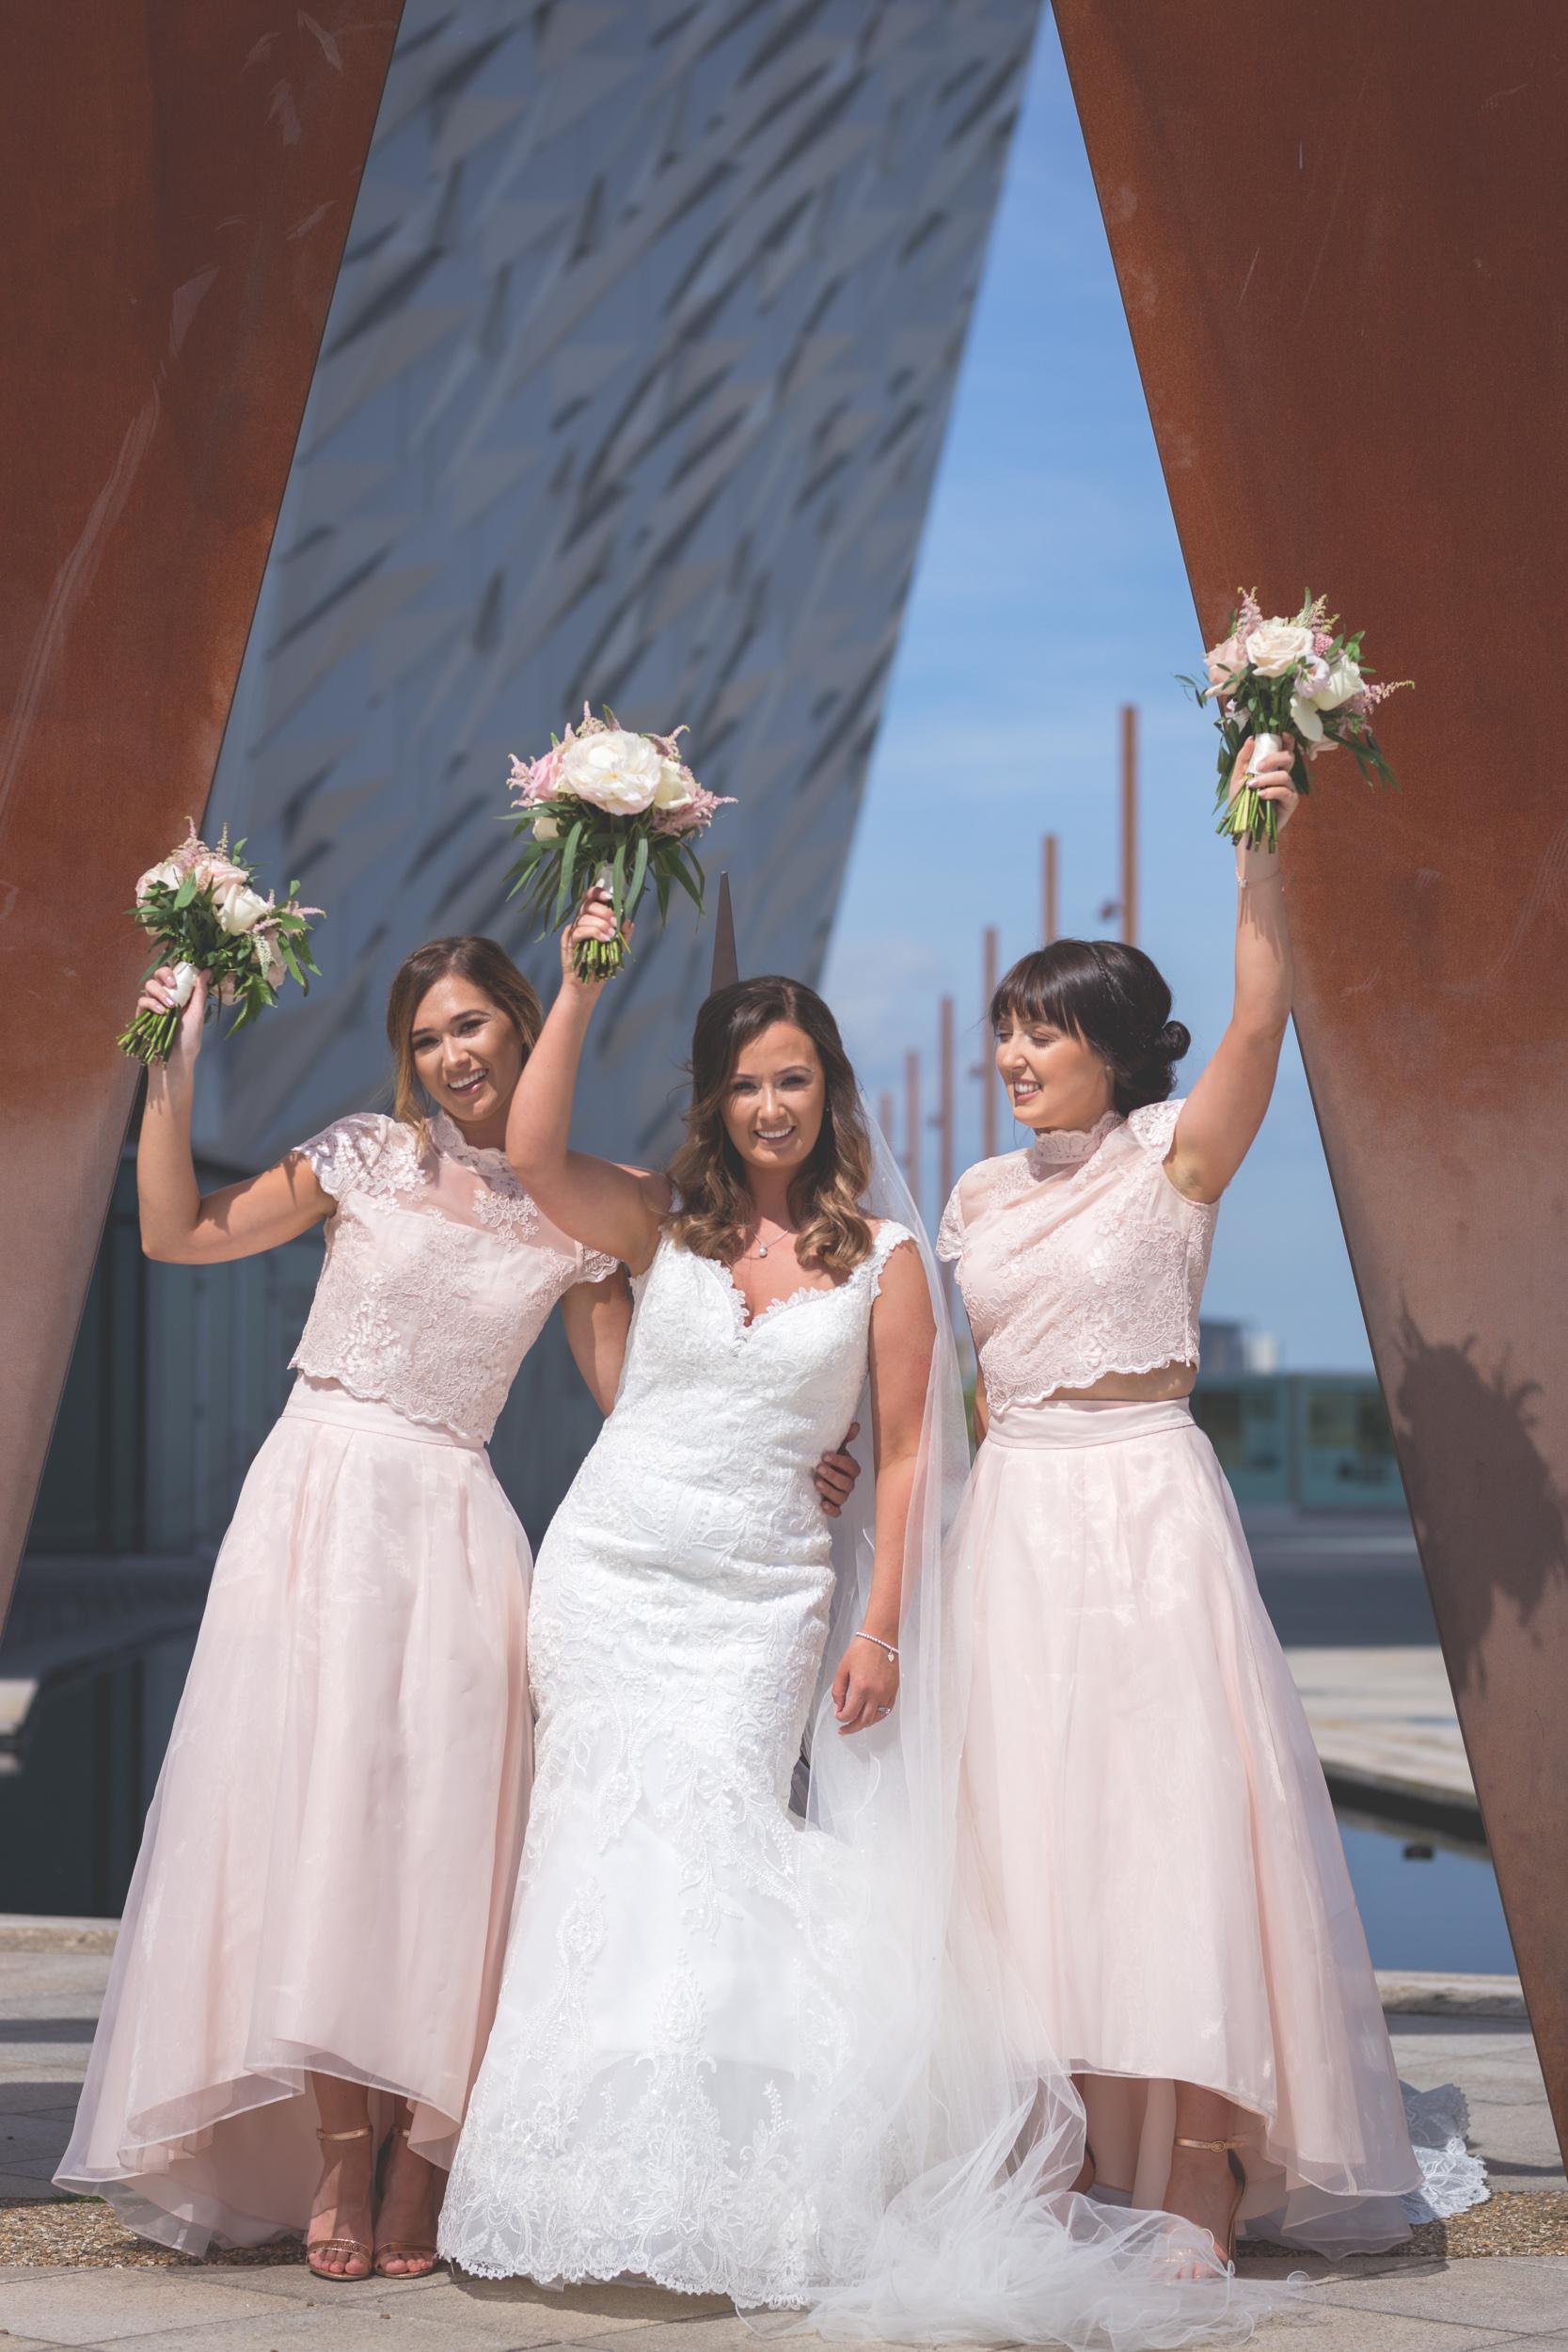 Brian McEwan   Northern Ireland Wedding Photographer   Rebecca & Michael   Portraits-70.jpg